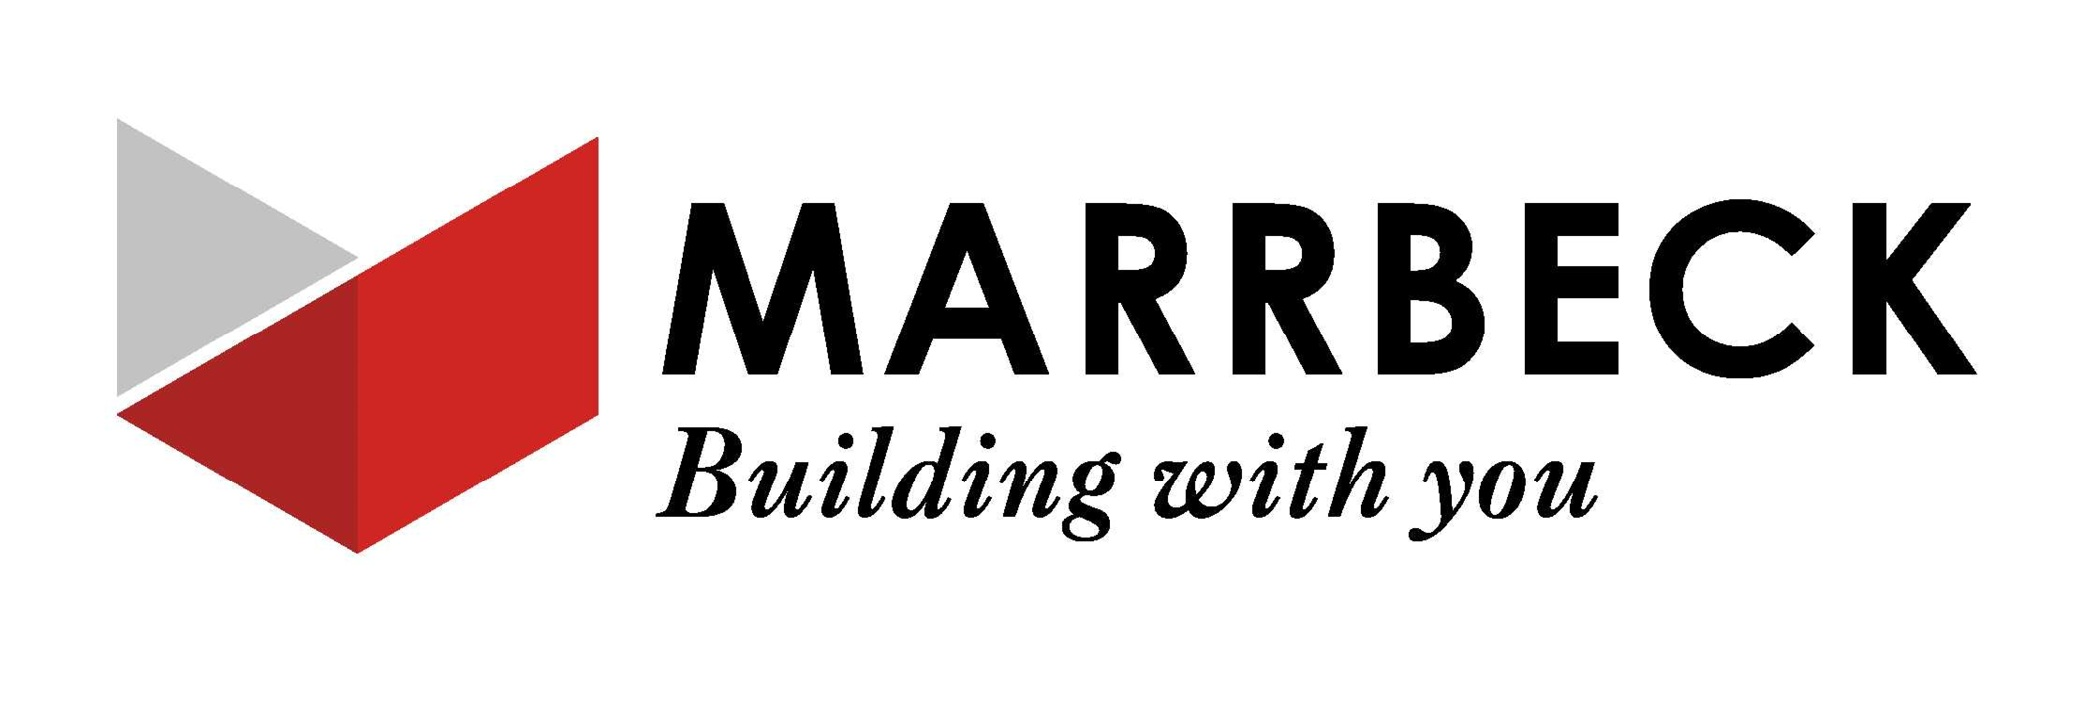 Marrbeck.png